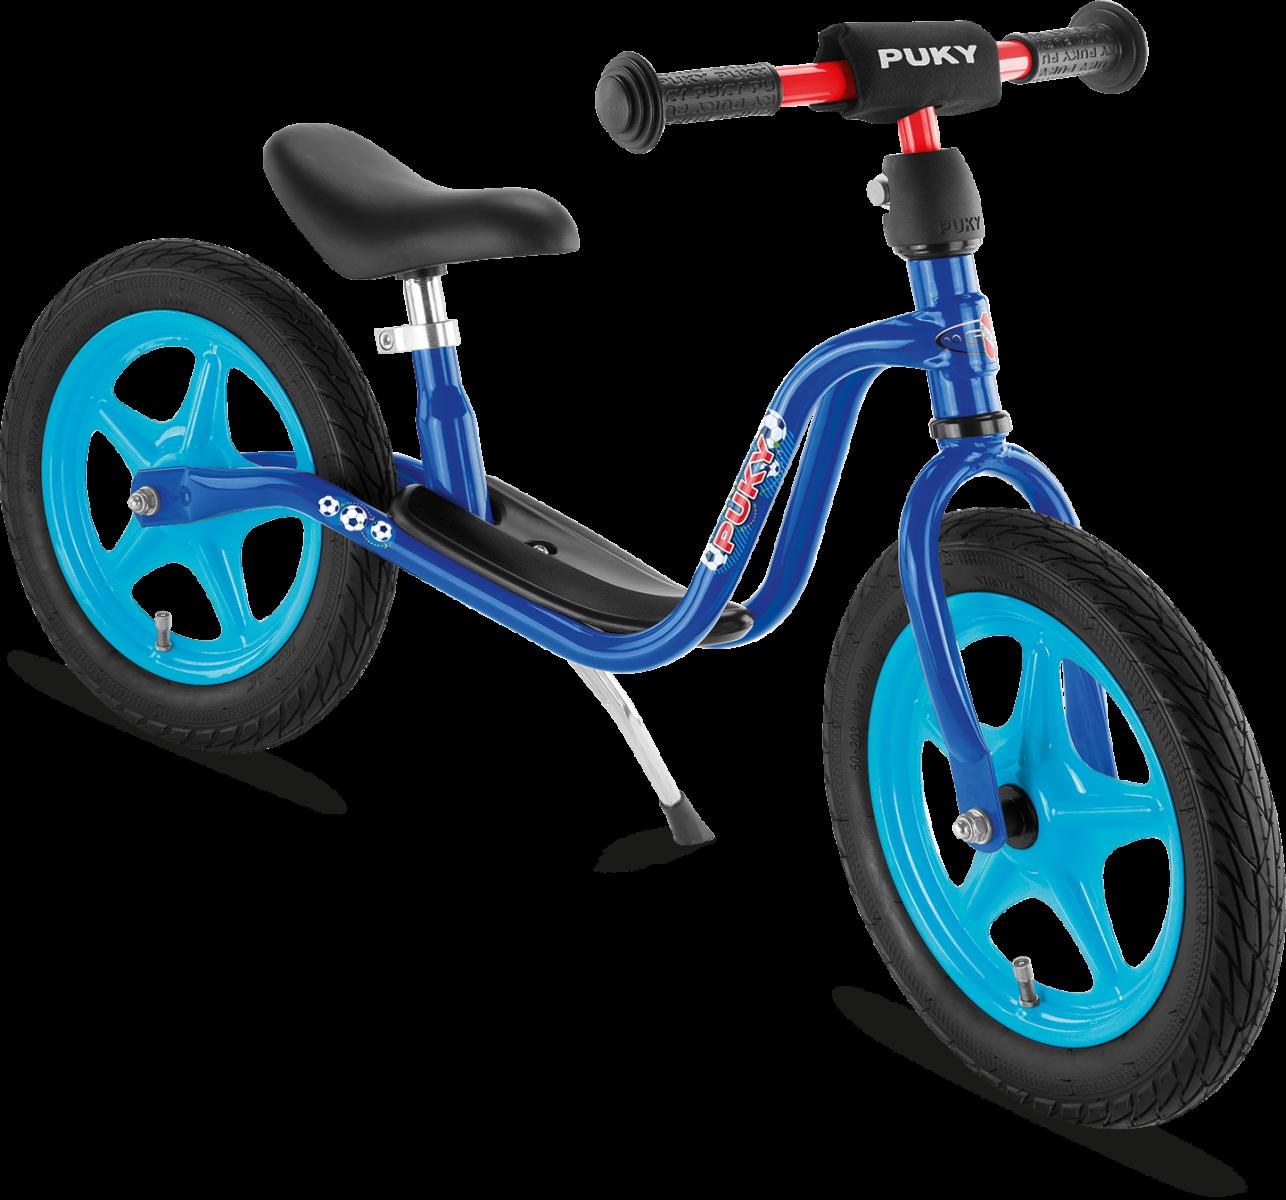 Puky LR 1 L Løbecykel - Blå